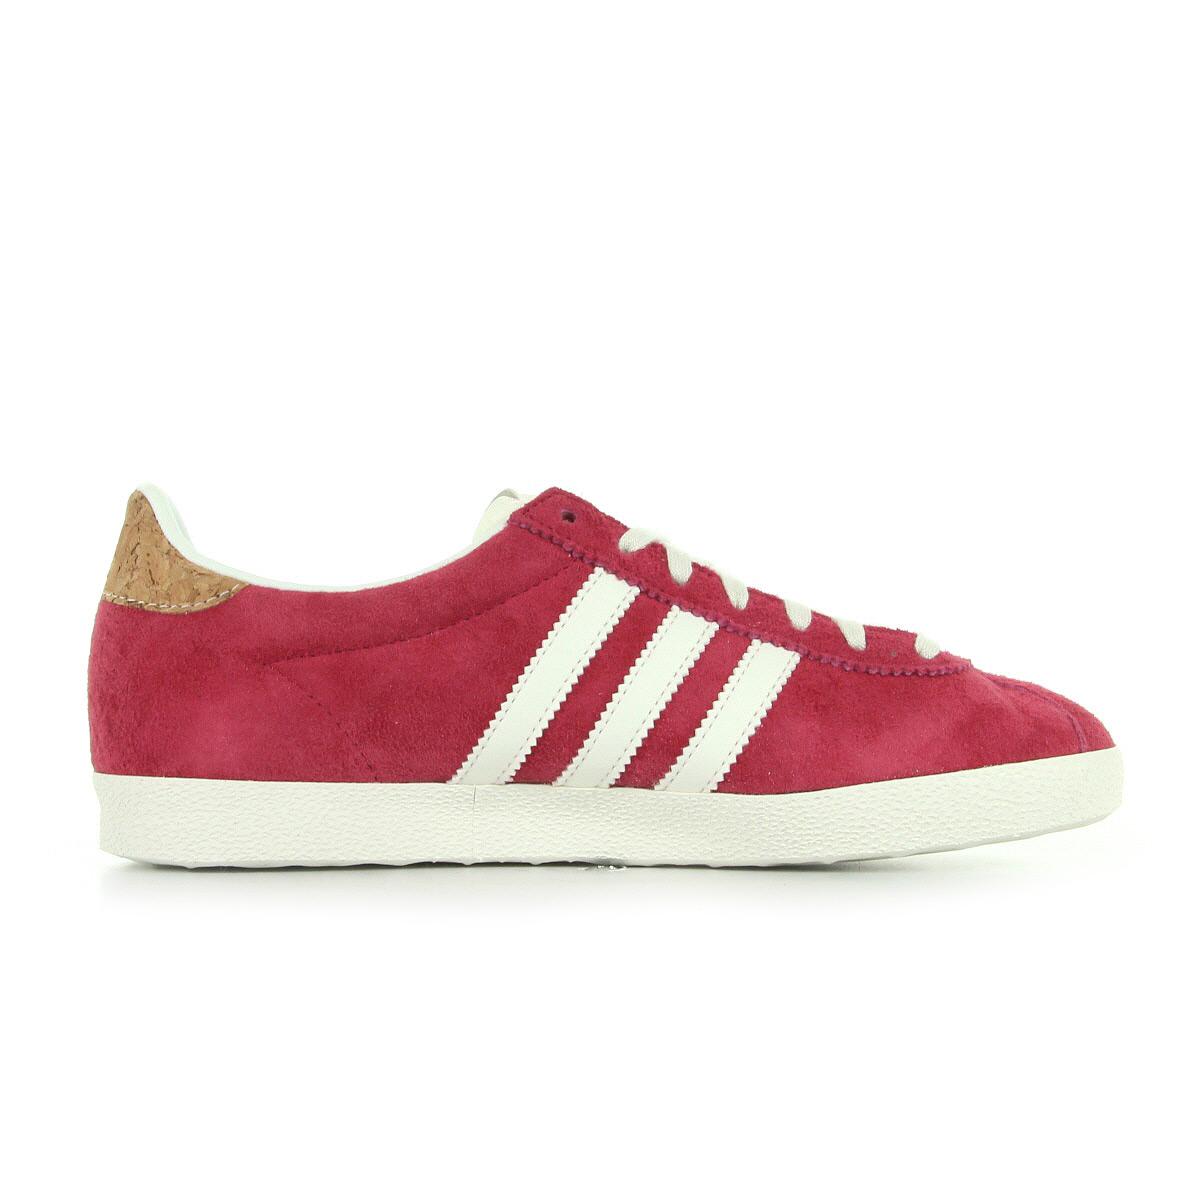 Chaussures baskets Adidas Femme Gazelle OG W taille Rose